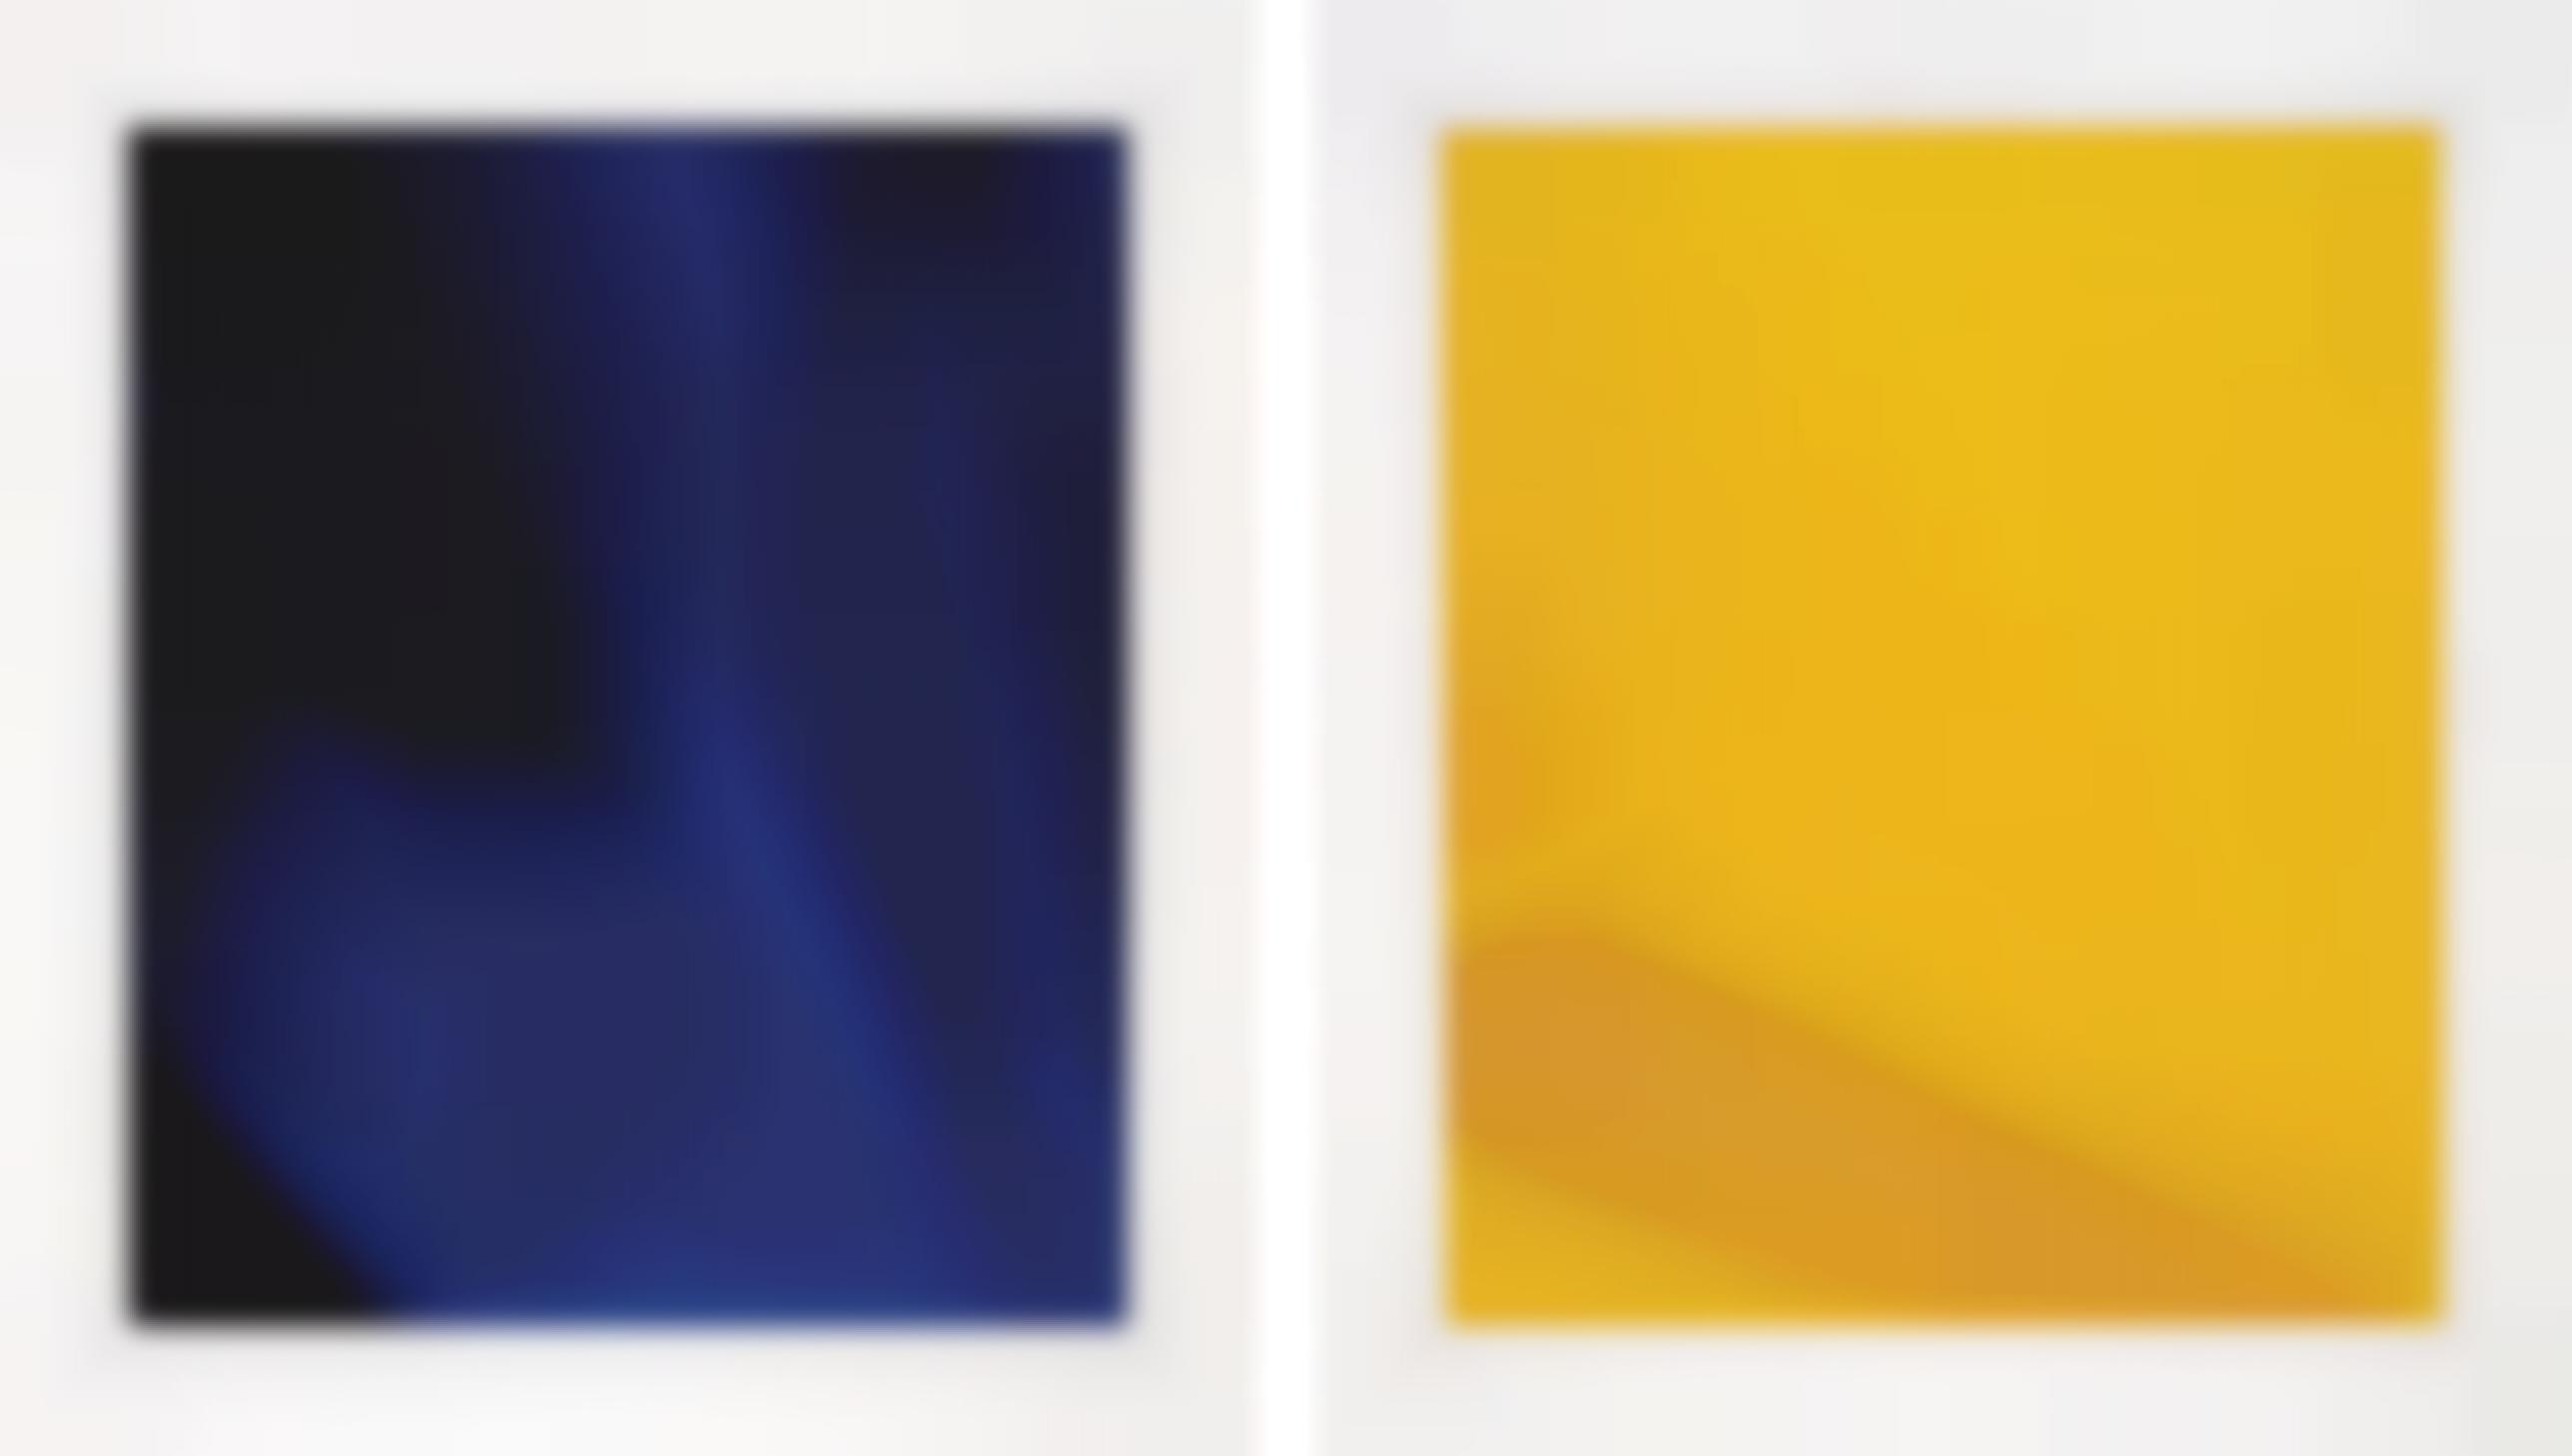 James Welling-Two Works: (i) Degrade Indv; (ii) Degrade Icyv-2003